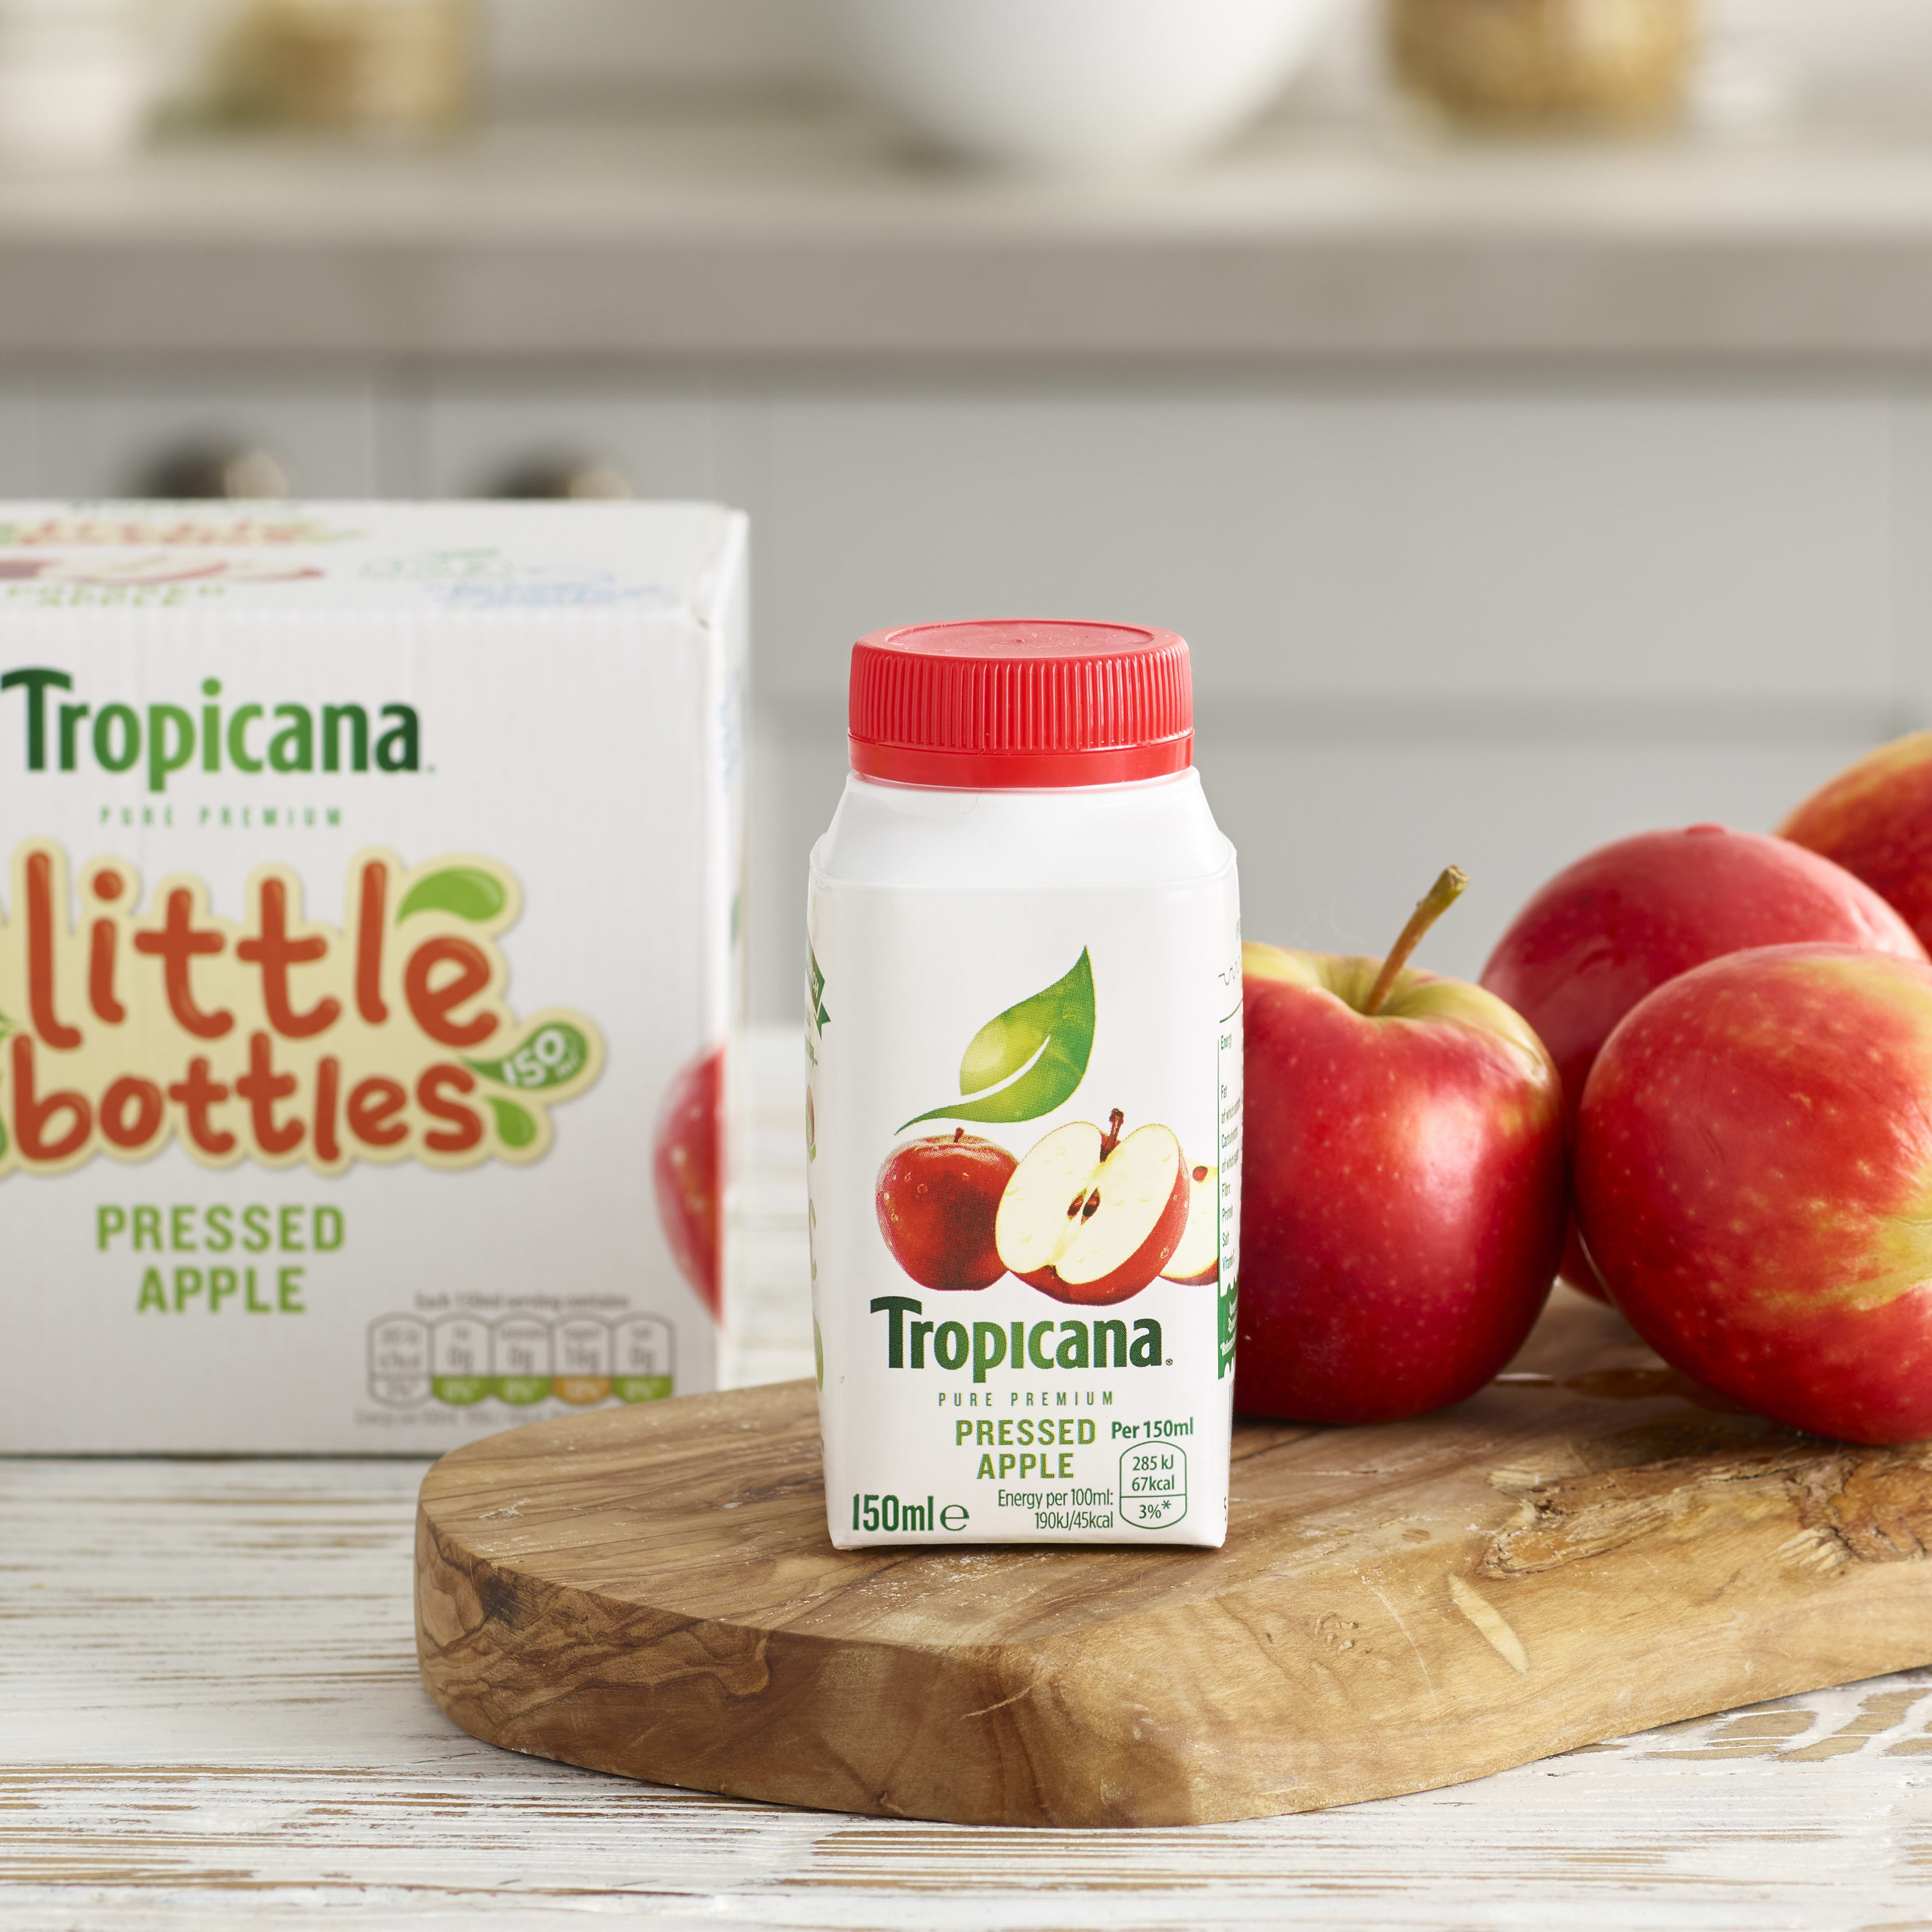 Tropicana little bottles, Apple 6 x 150ml